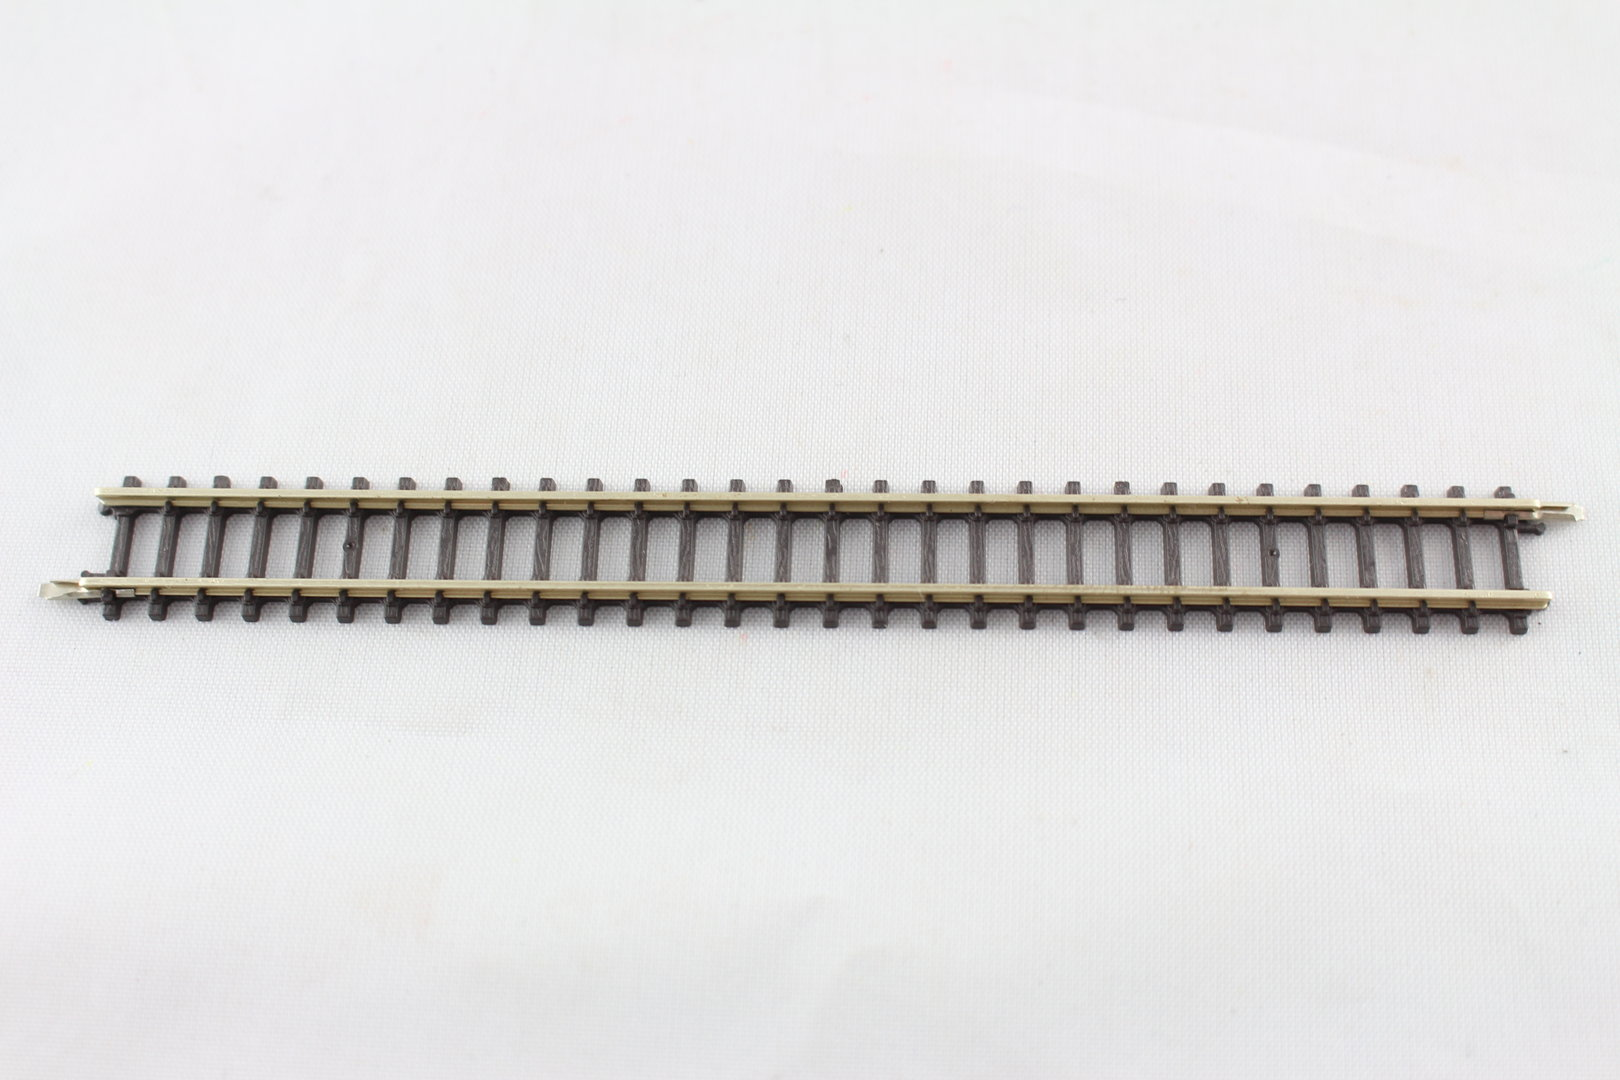 8500 gerades Gleis 110mm Märklin mini-club Spur Z Top+